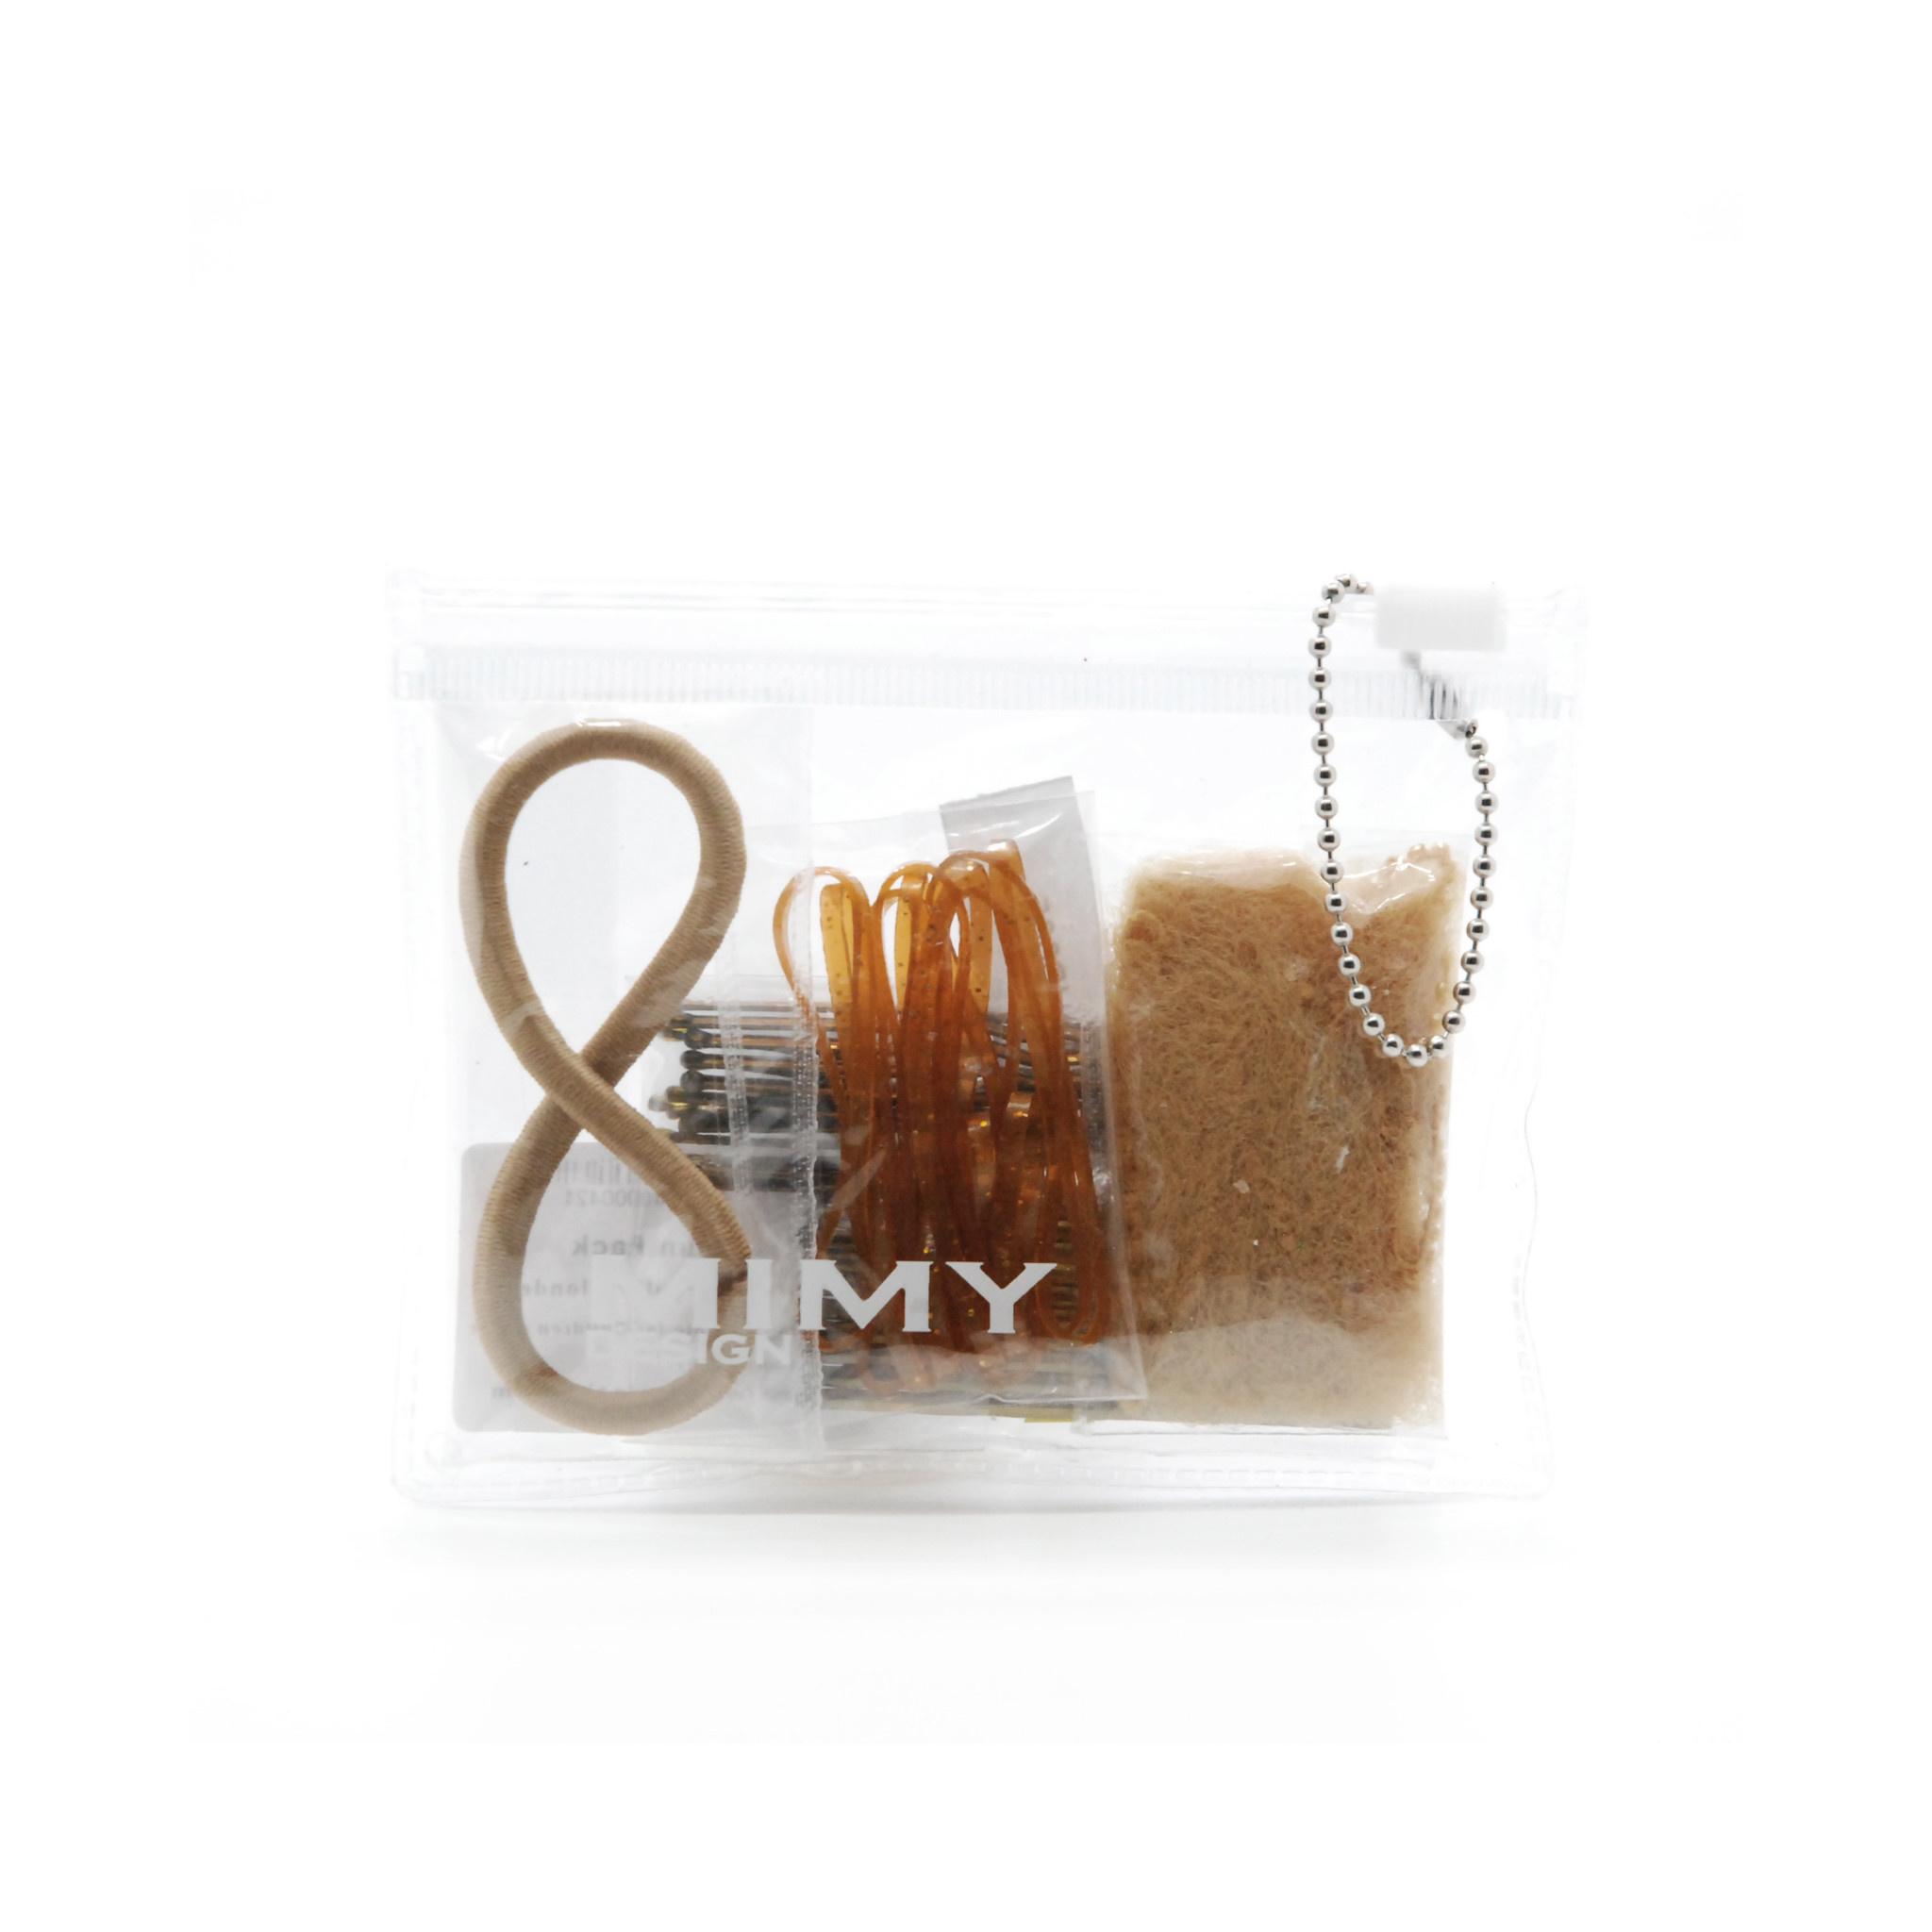 Mimy Design Ensemble pour chignon - Mimy Design